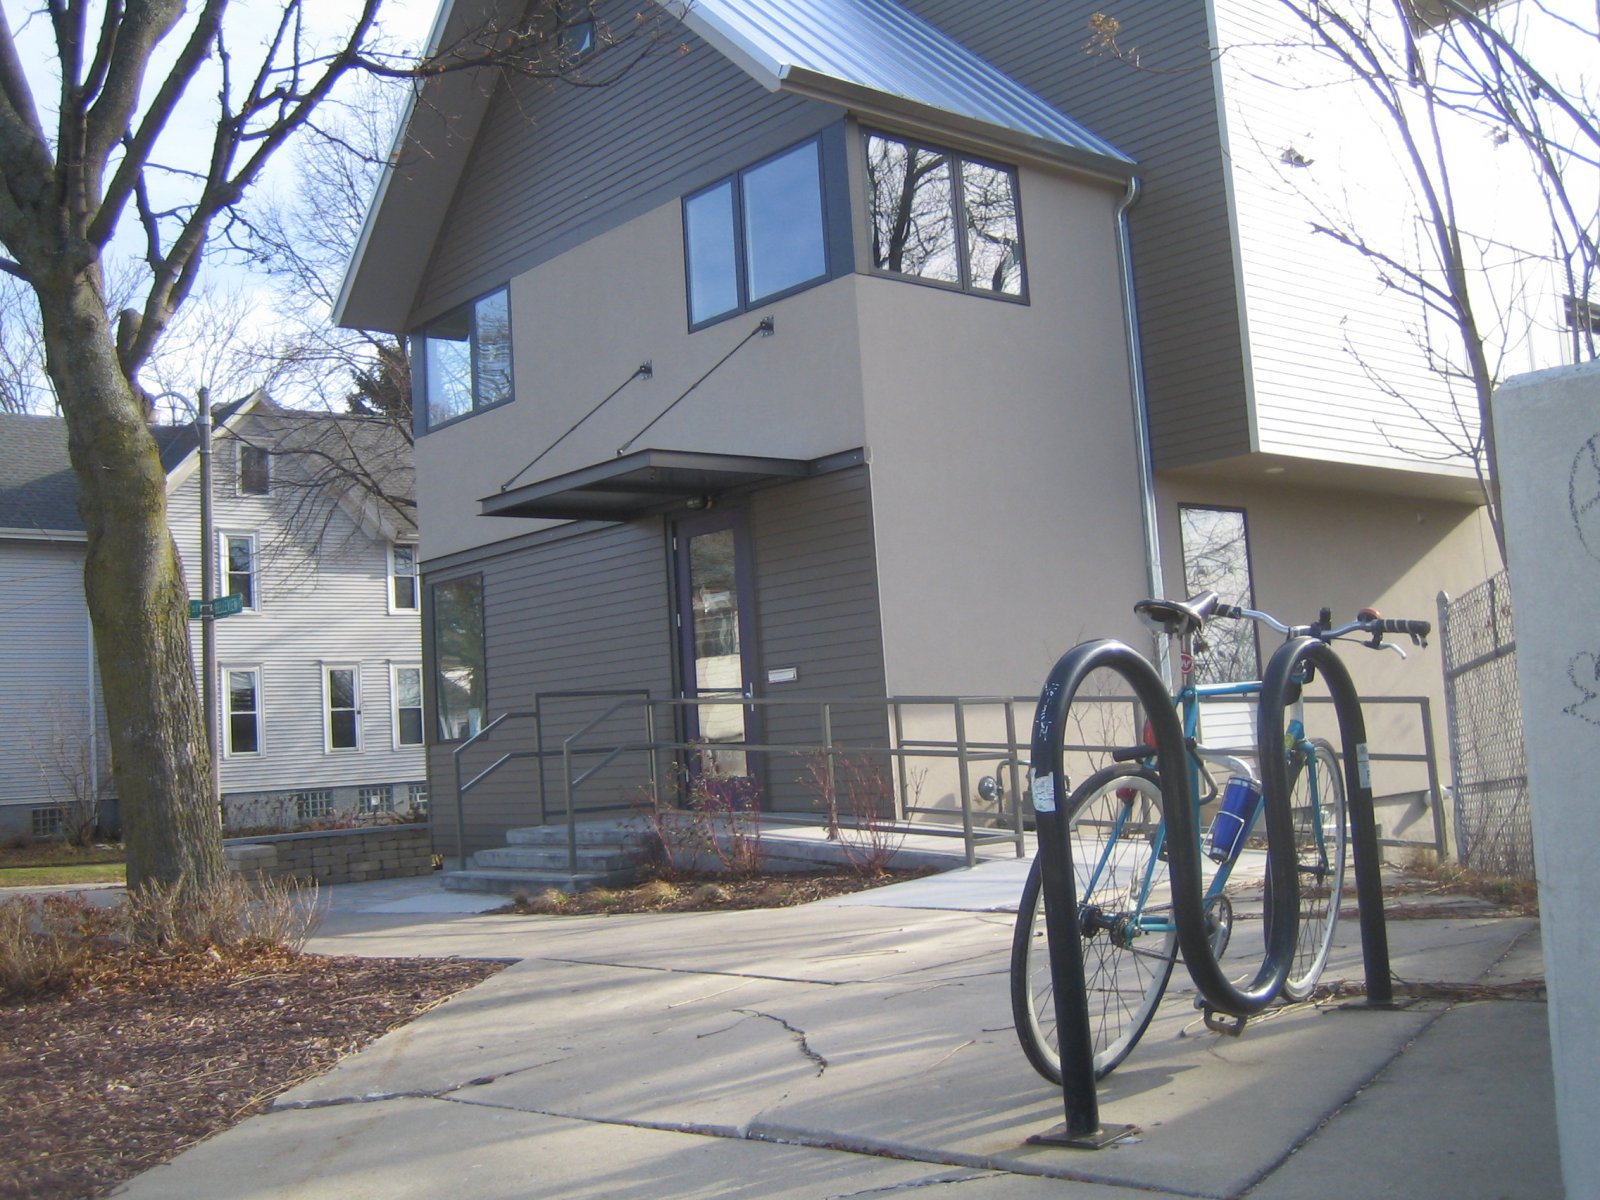 Bike rack in front of the BikePath Building.